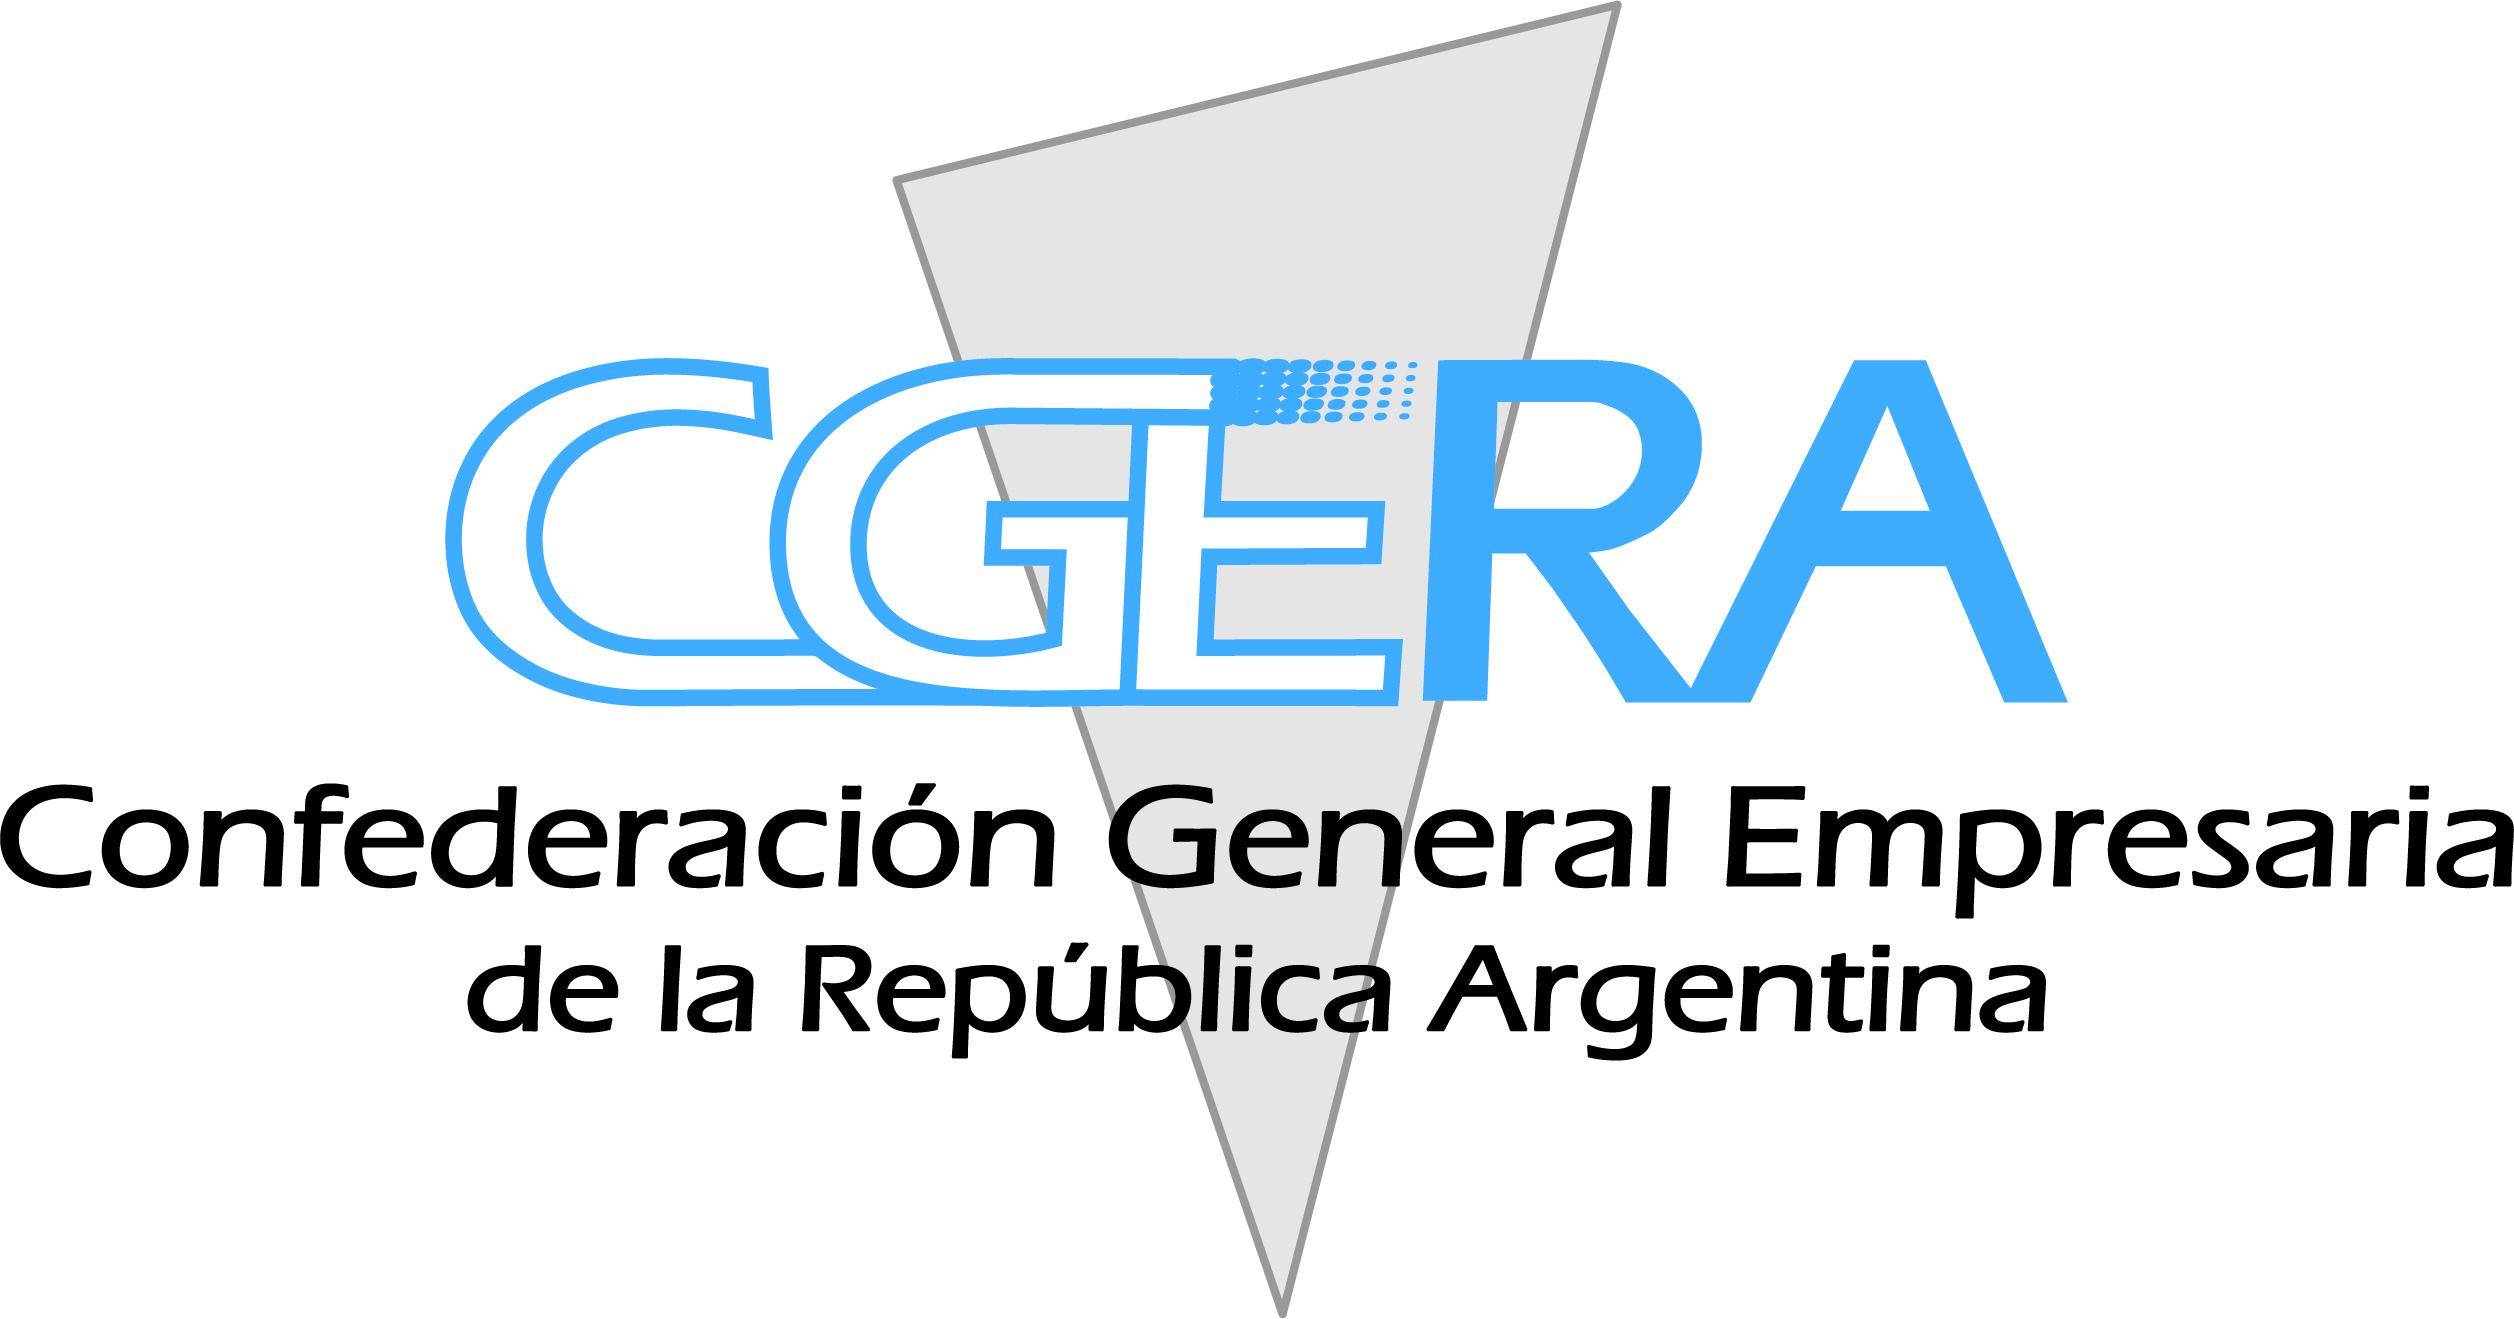 LOGO CGERA.jpg